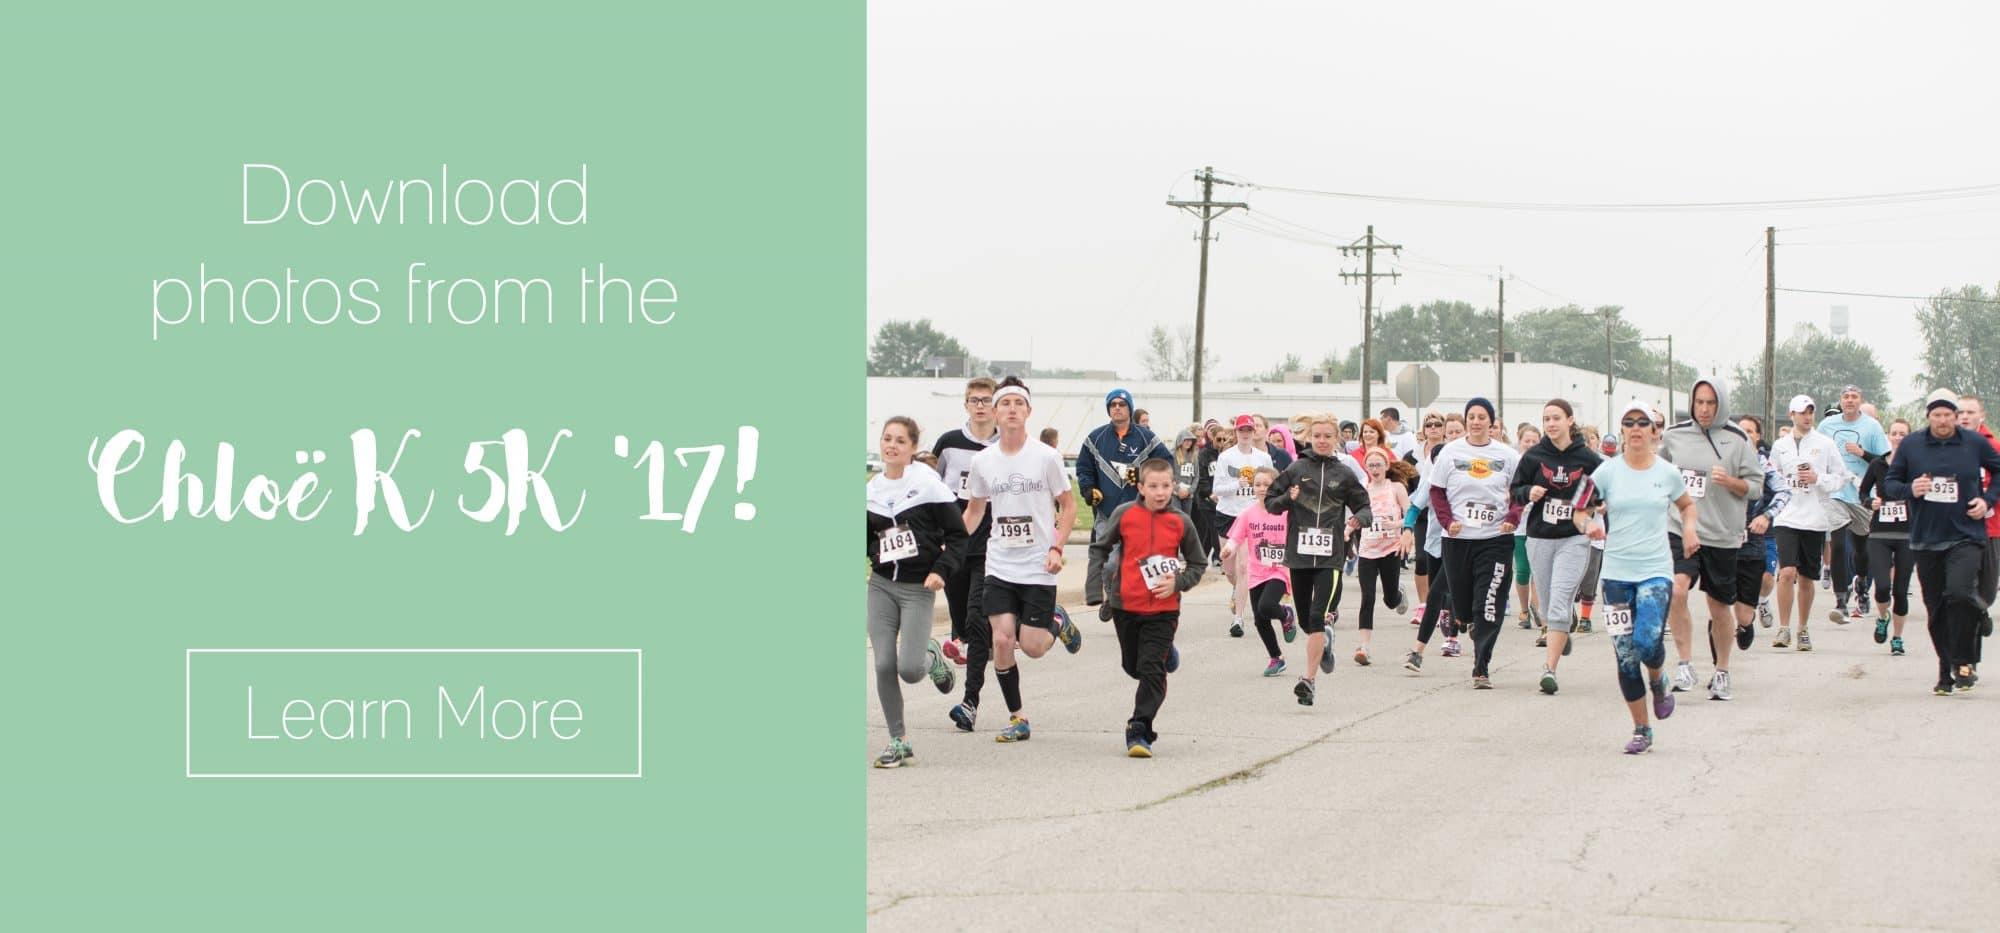 Chloe K 5K 2017 | Run for Autism | Renssleaer Indiana | Chloe Rayburn | Jeff and Susie Rayburn